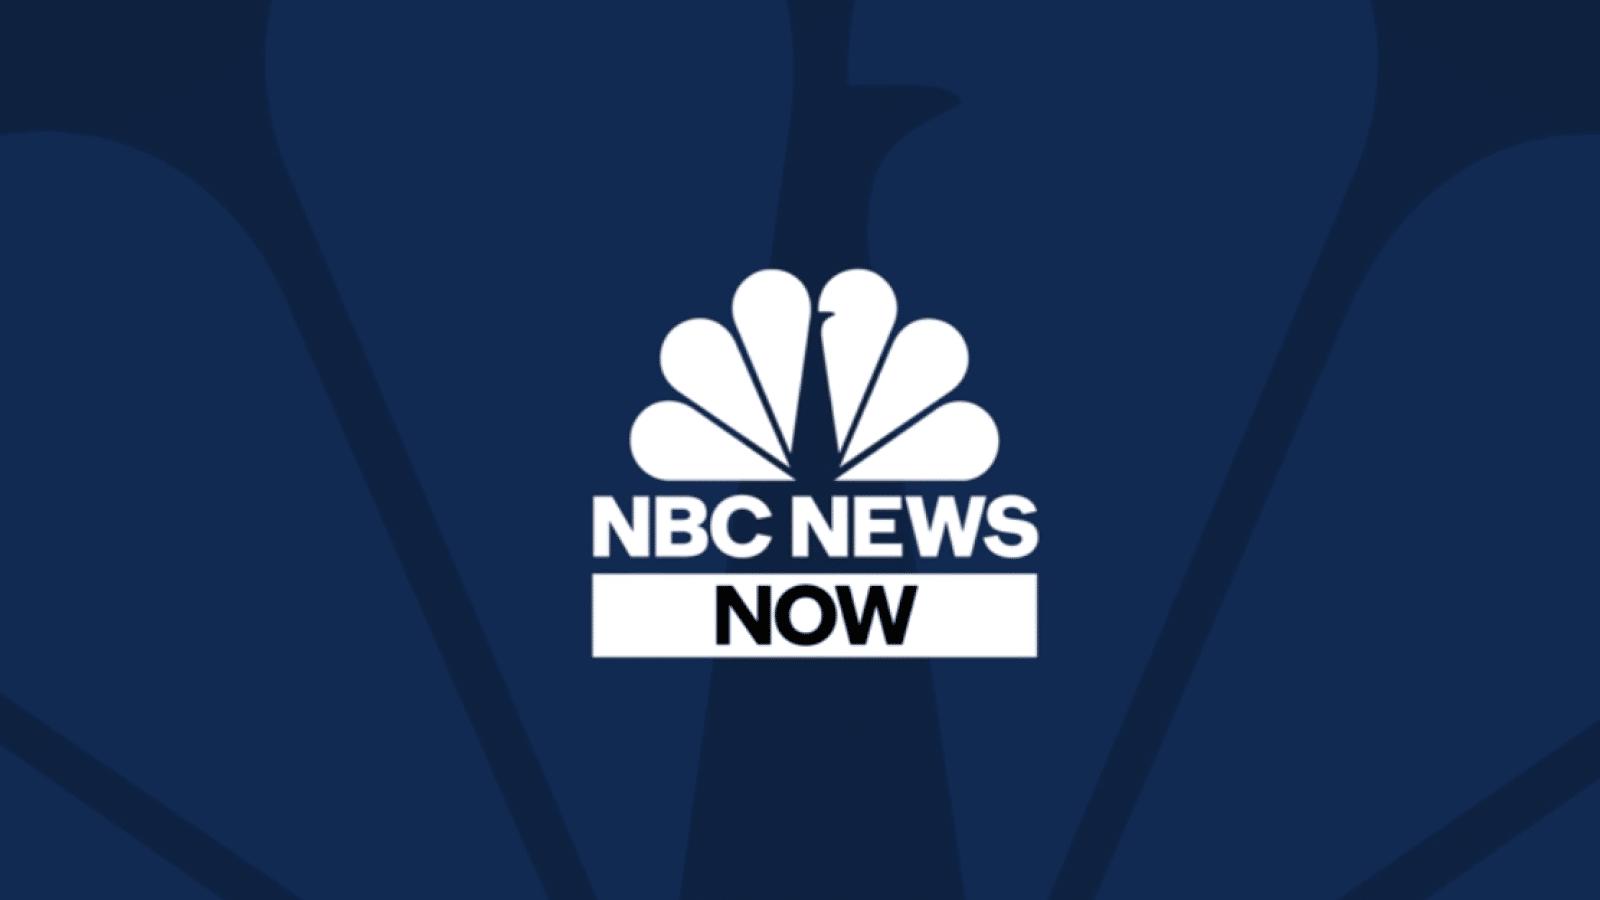 nbc news now logo on dark blue background